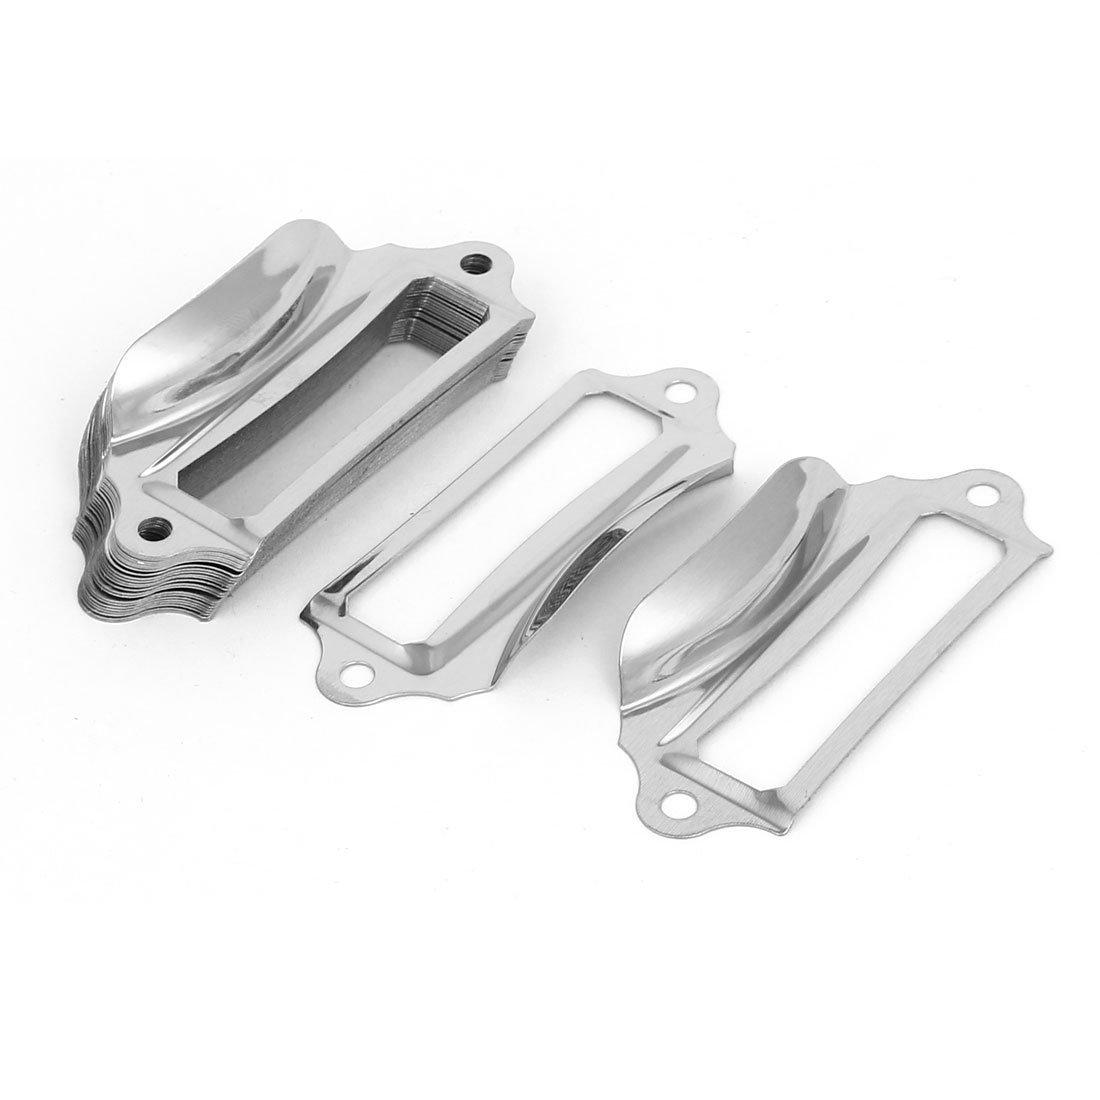 sourcingmap® Cabinet Drawer 69mm Long Metal Card Tag Frame Label Holder Pull Handles 25pcs a16121200ux1207